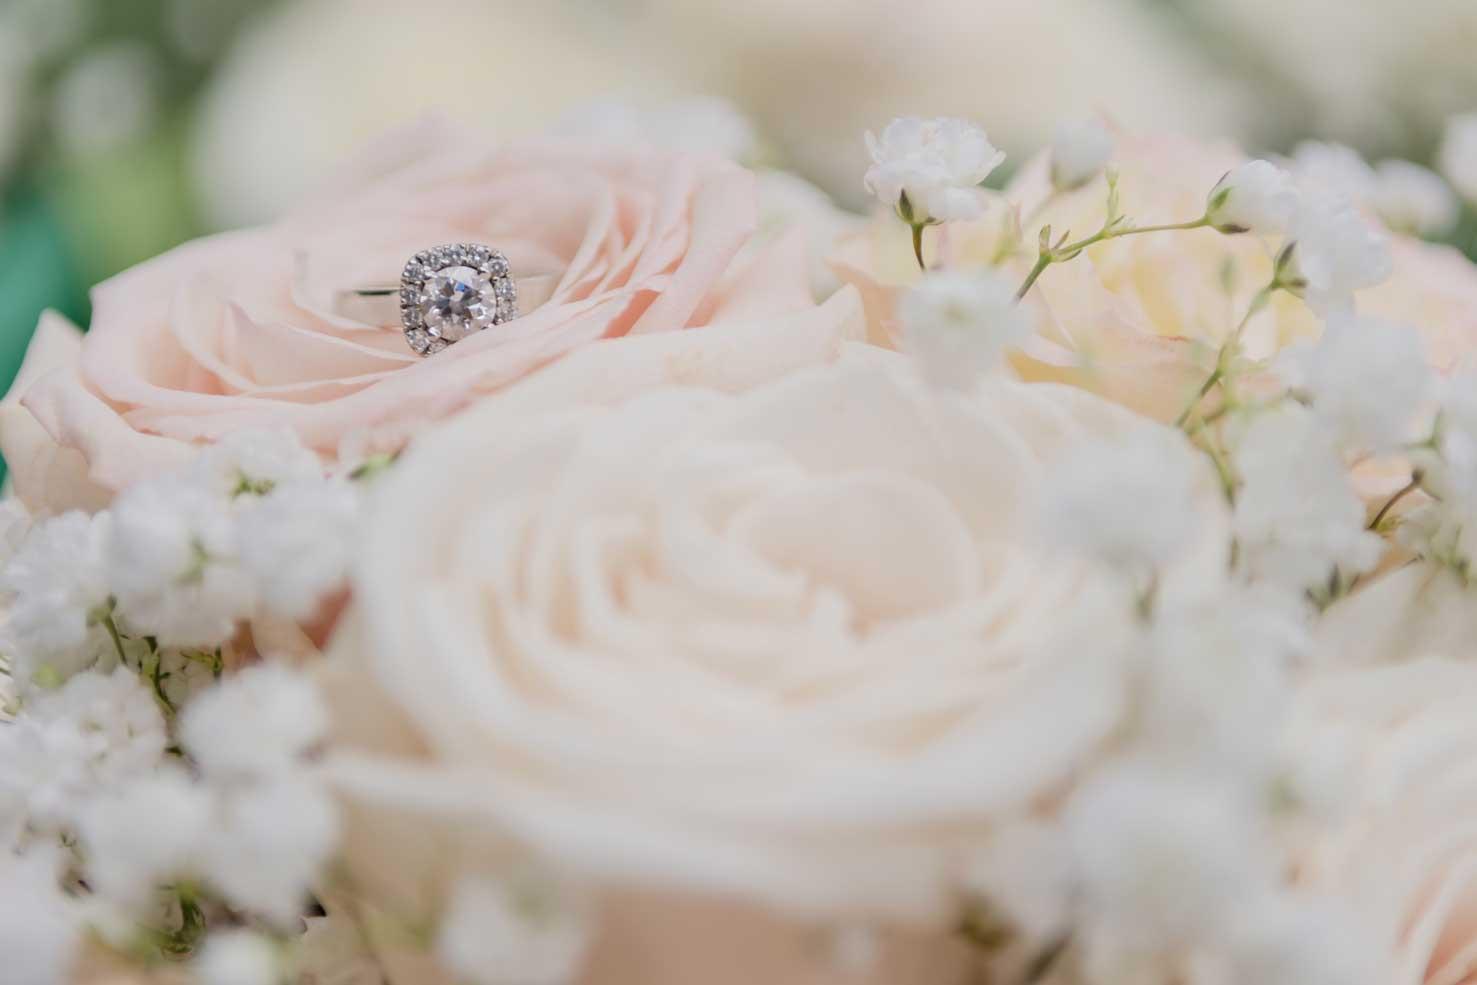 Engagemet ring & Bouquet